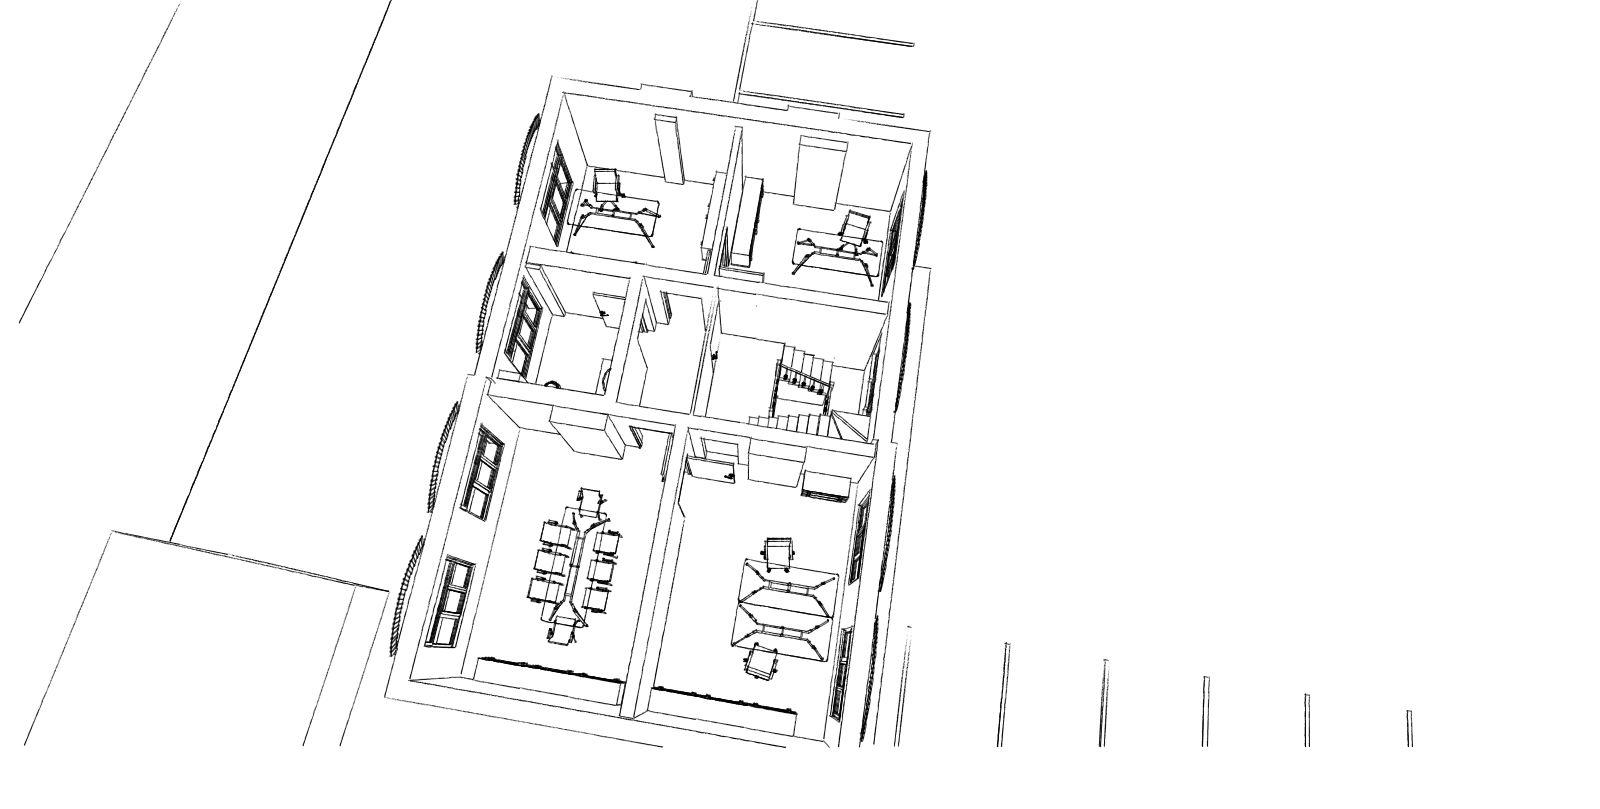 Plan de maison a construire maison plan bewildering on modern interior and exterior ideas for Ma maison en 3d gratuit